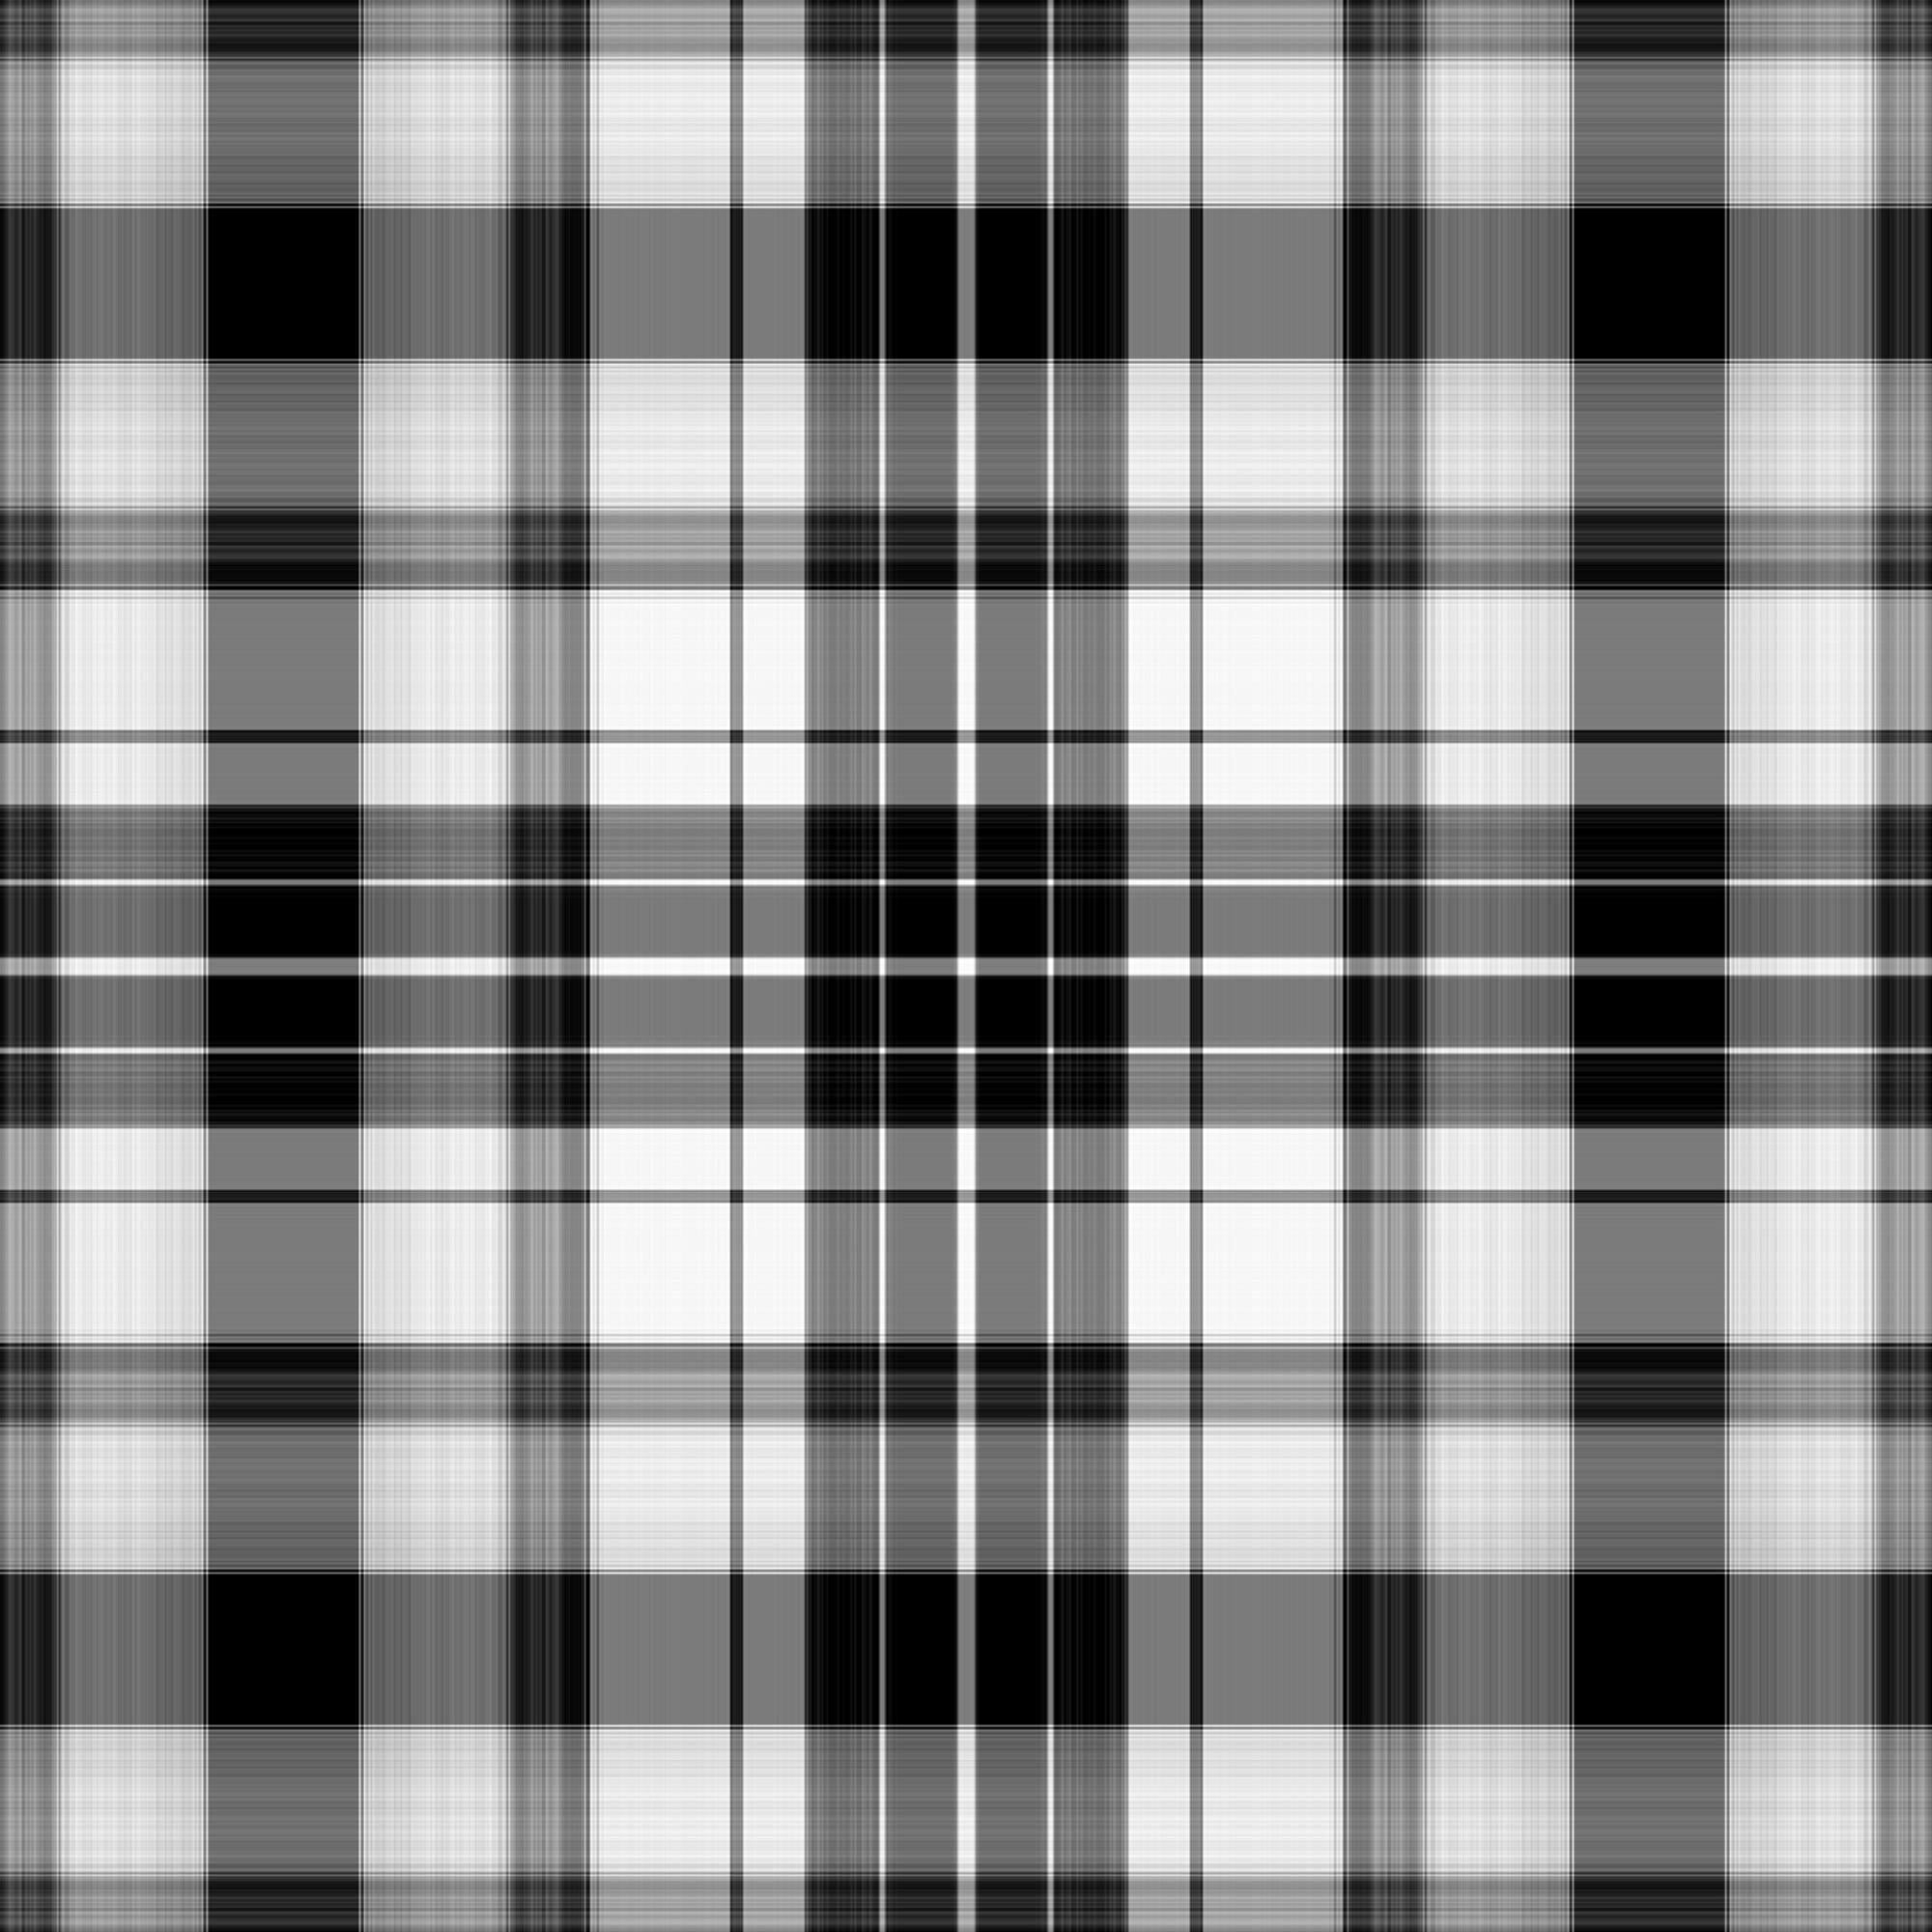 [44+] Black checked Wallpaper on WallpaperSafari